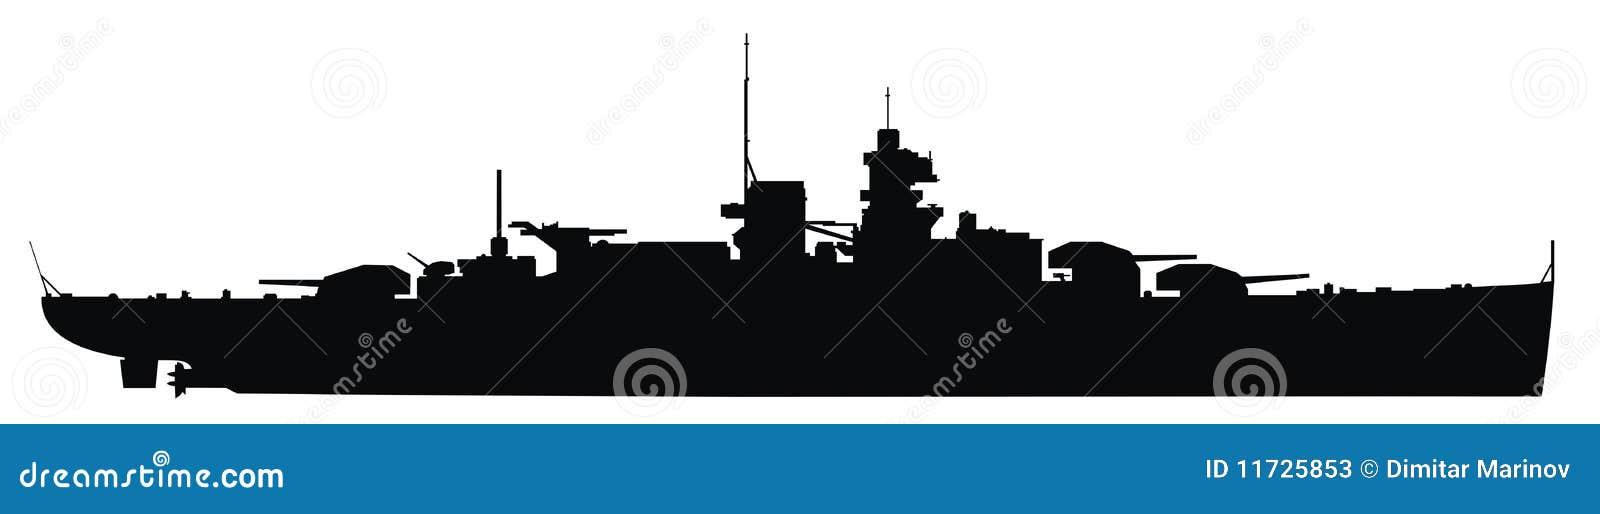 warship stock illustrations 1 978 warship stock illustrations rh dreamstime com Battleship Silhouette Clip Art battleship clipart black and white